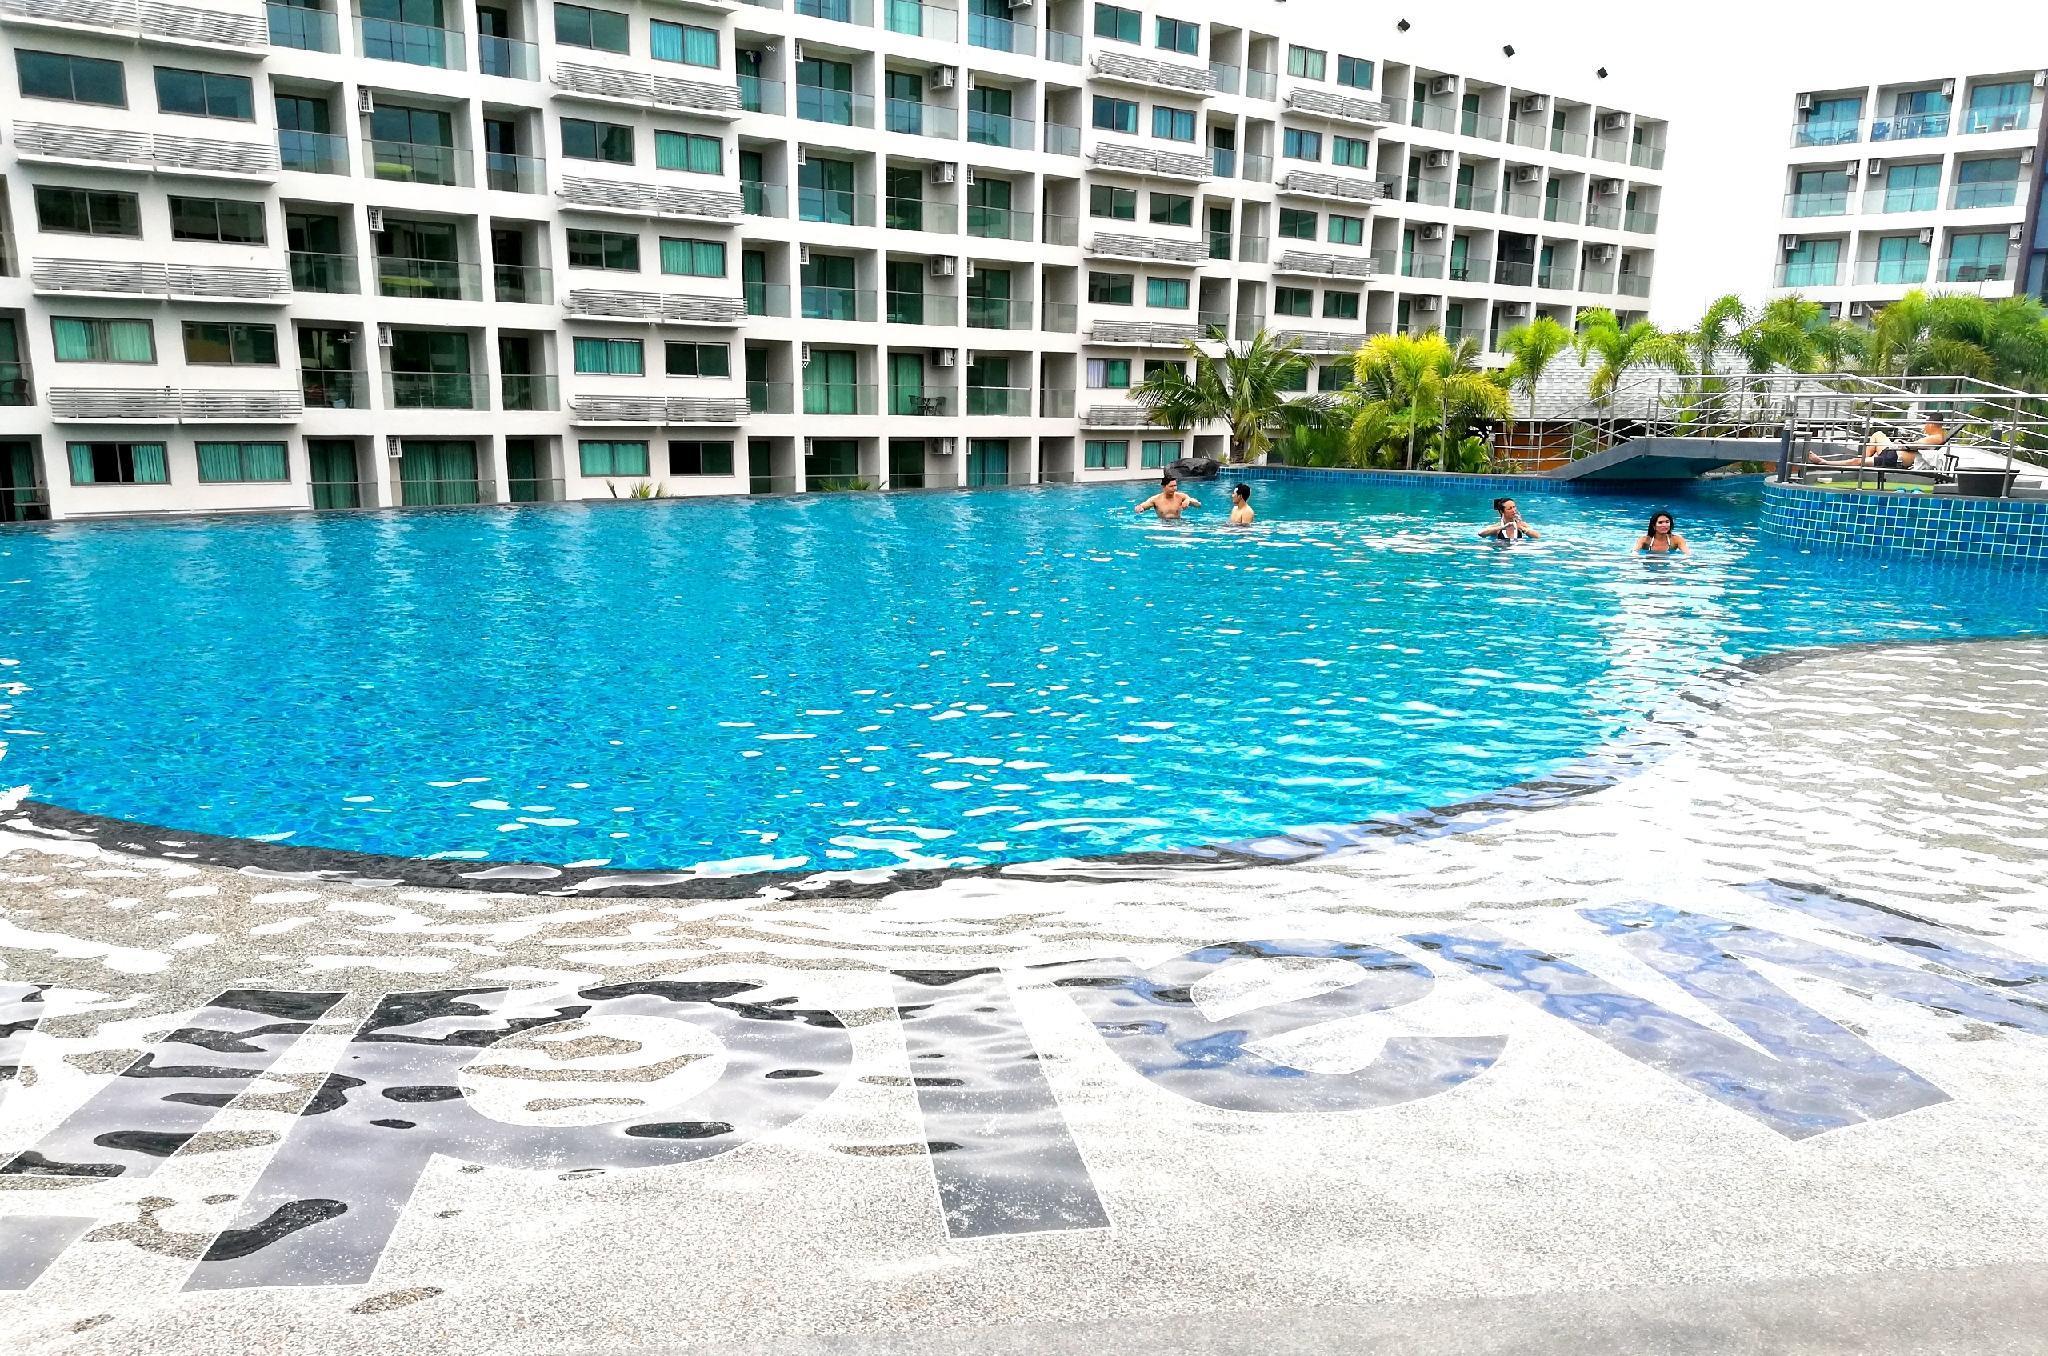 Maldives Pattaya Largest Pool  Pool View